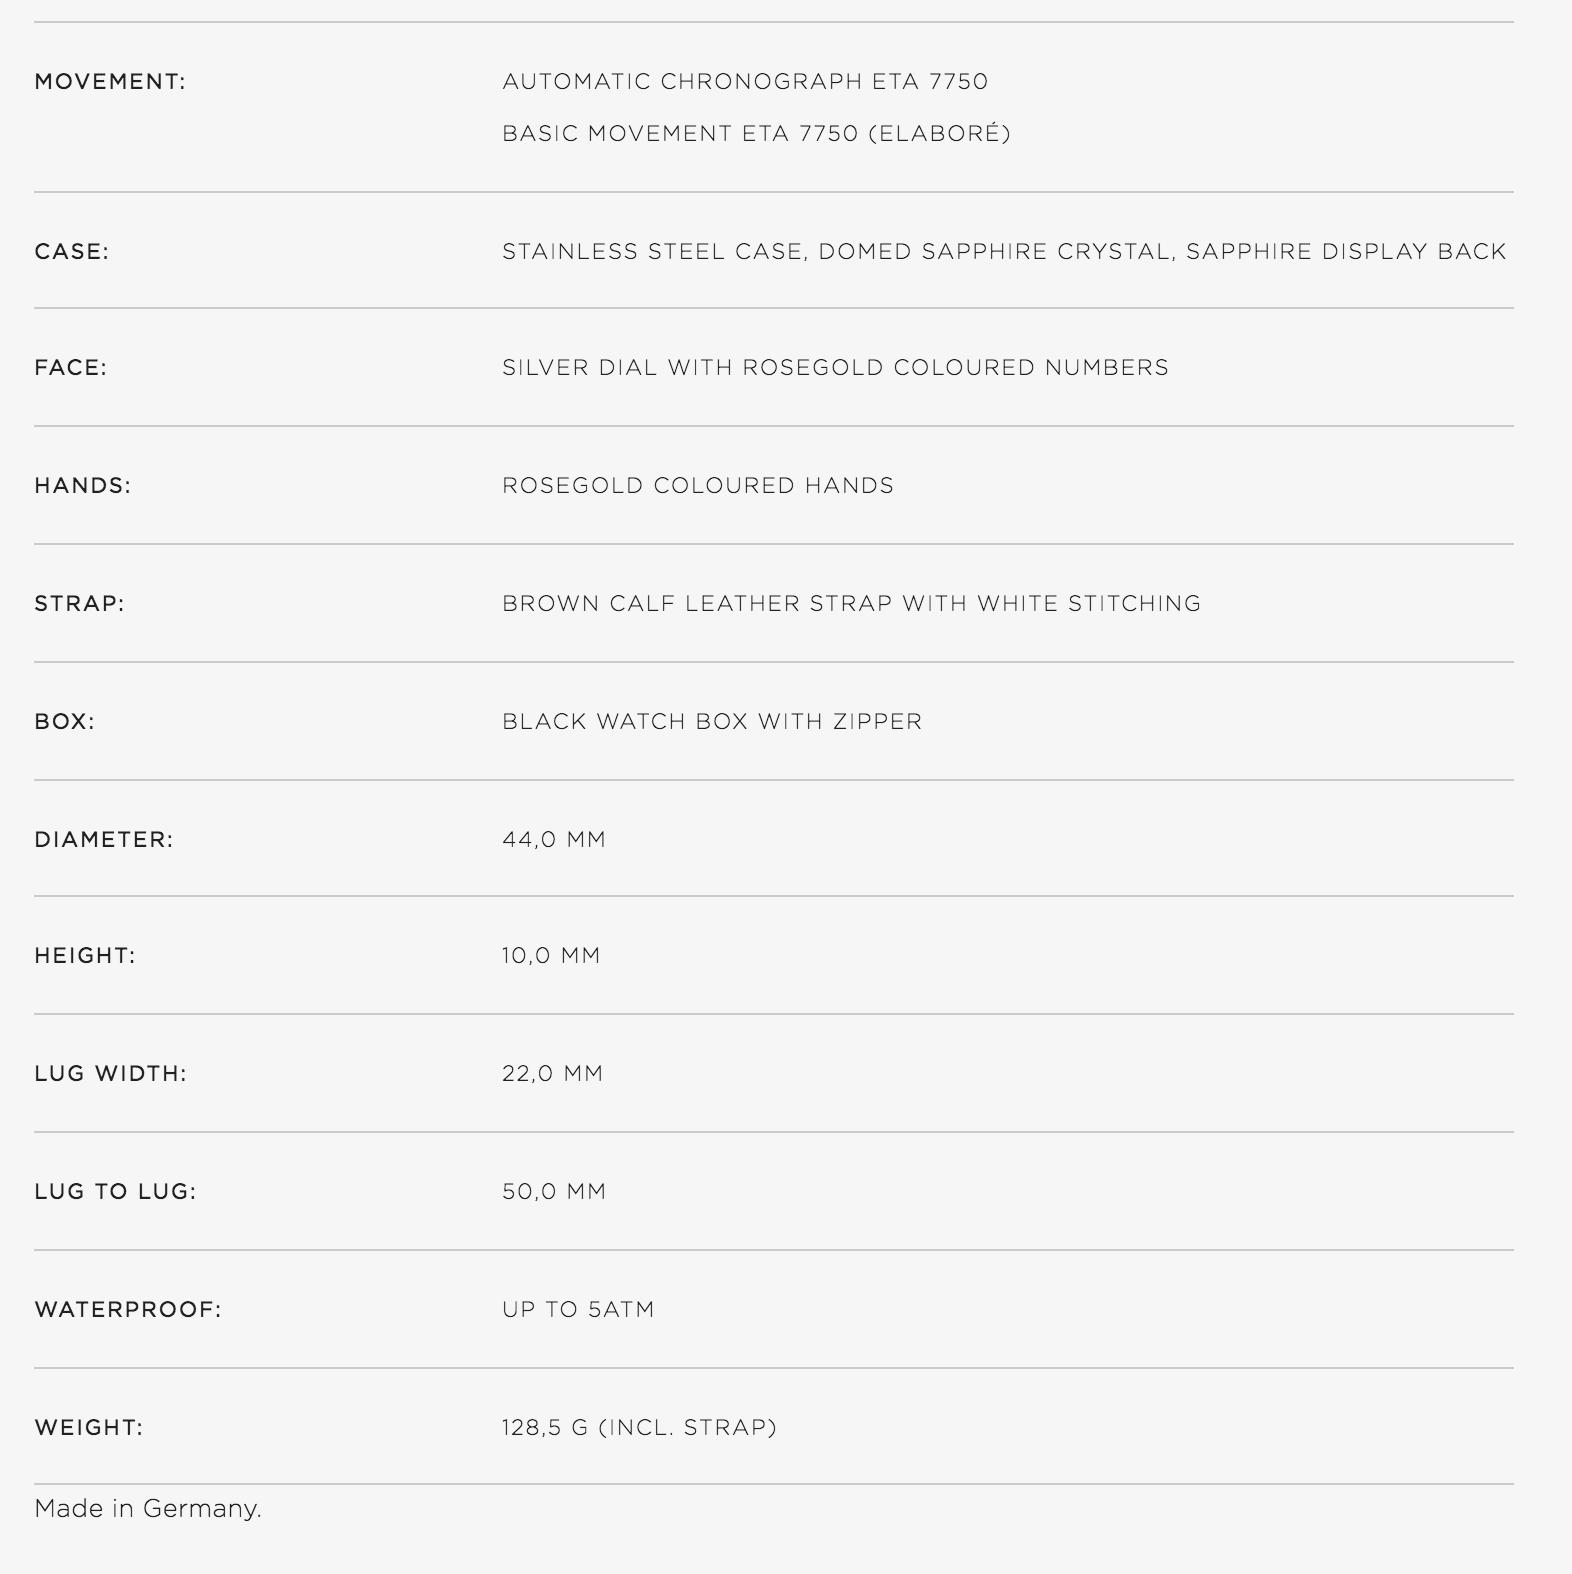 new ibm computers